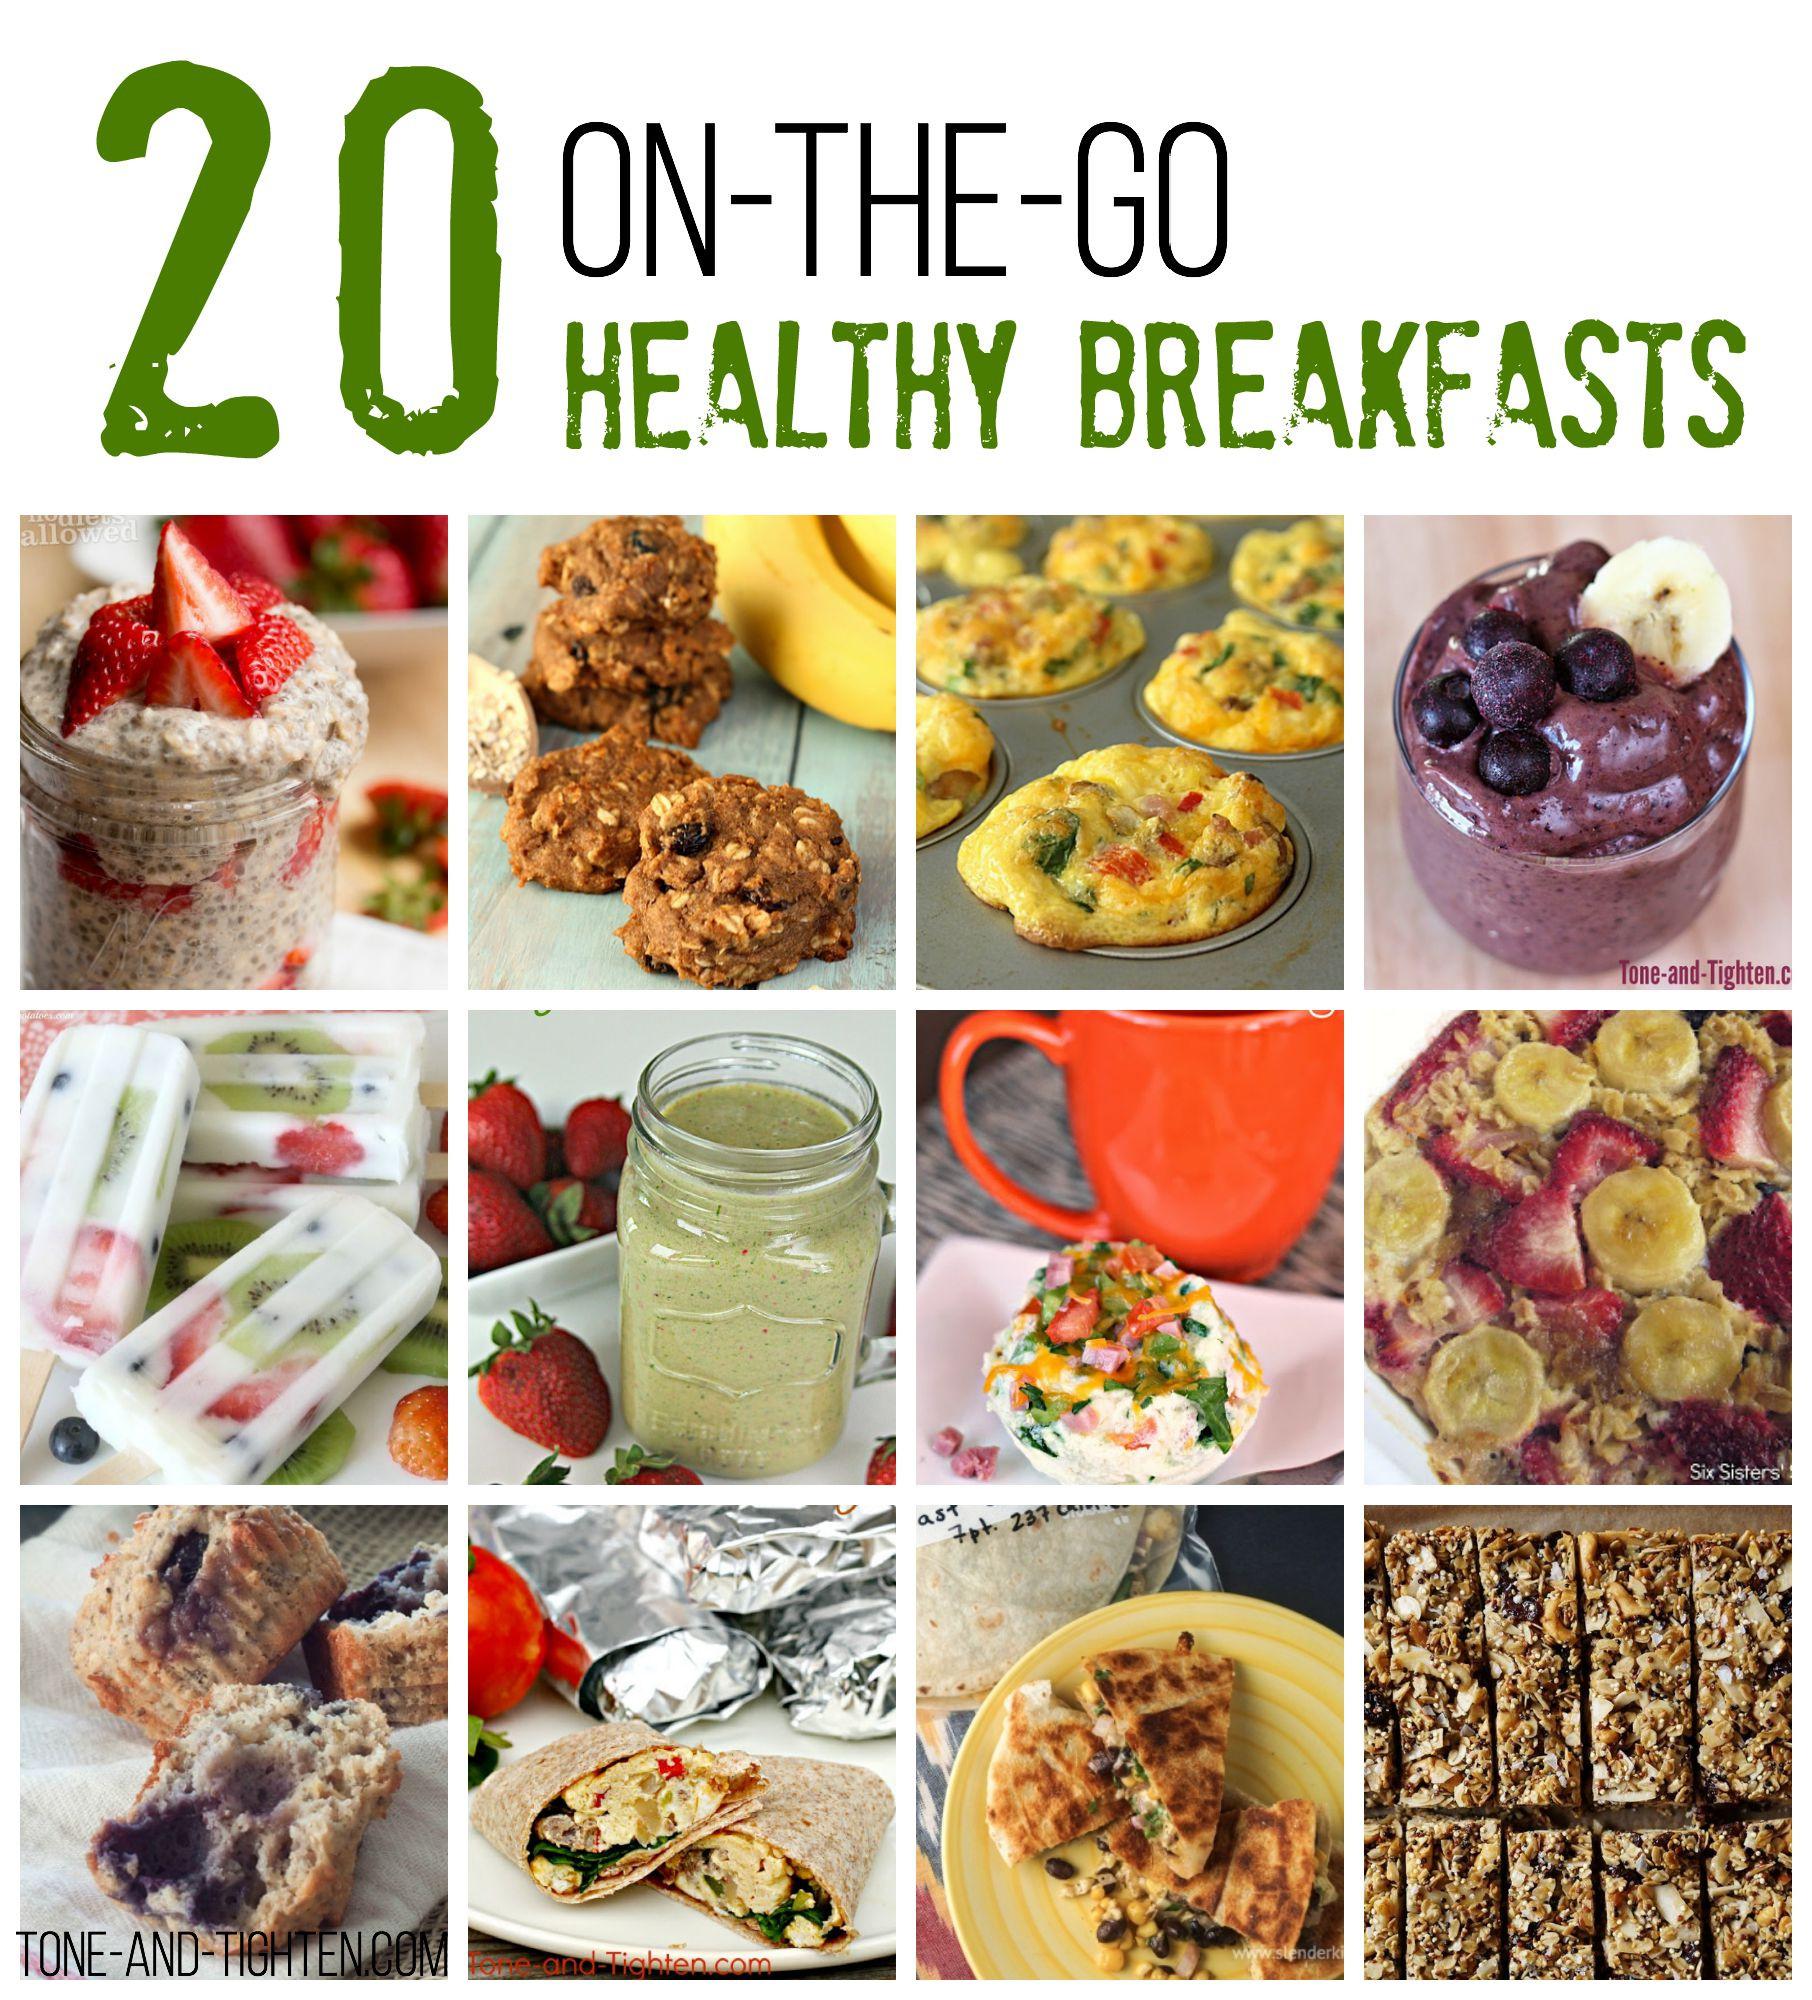 Healthy Breakfast On The Go  20 The Go Healthy Breakfast Recipes